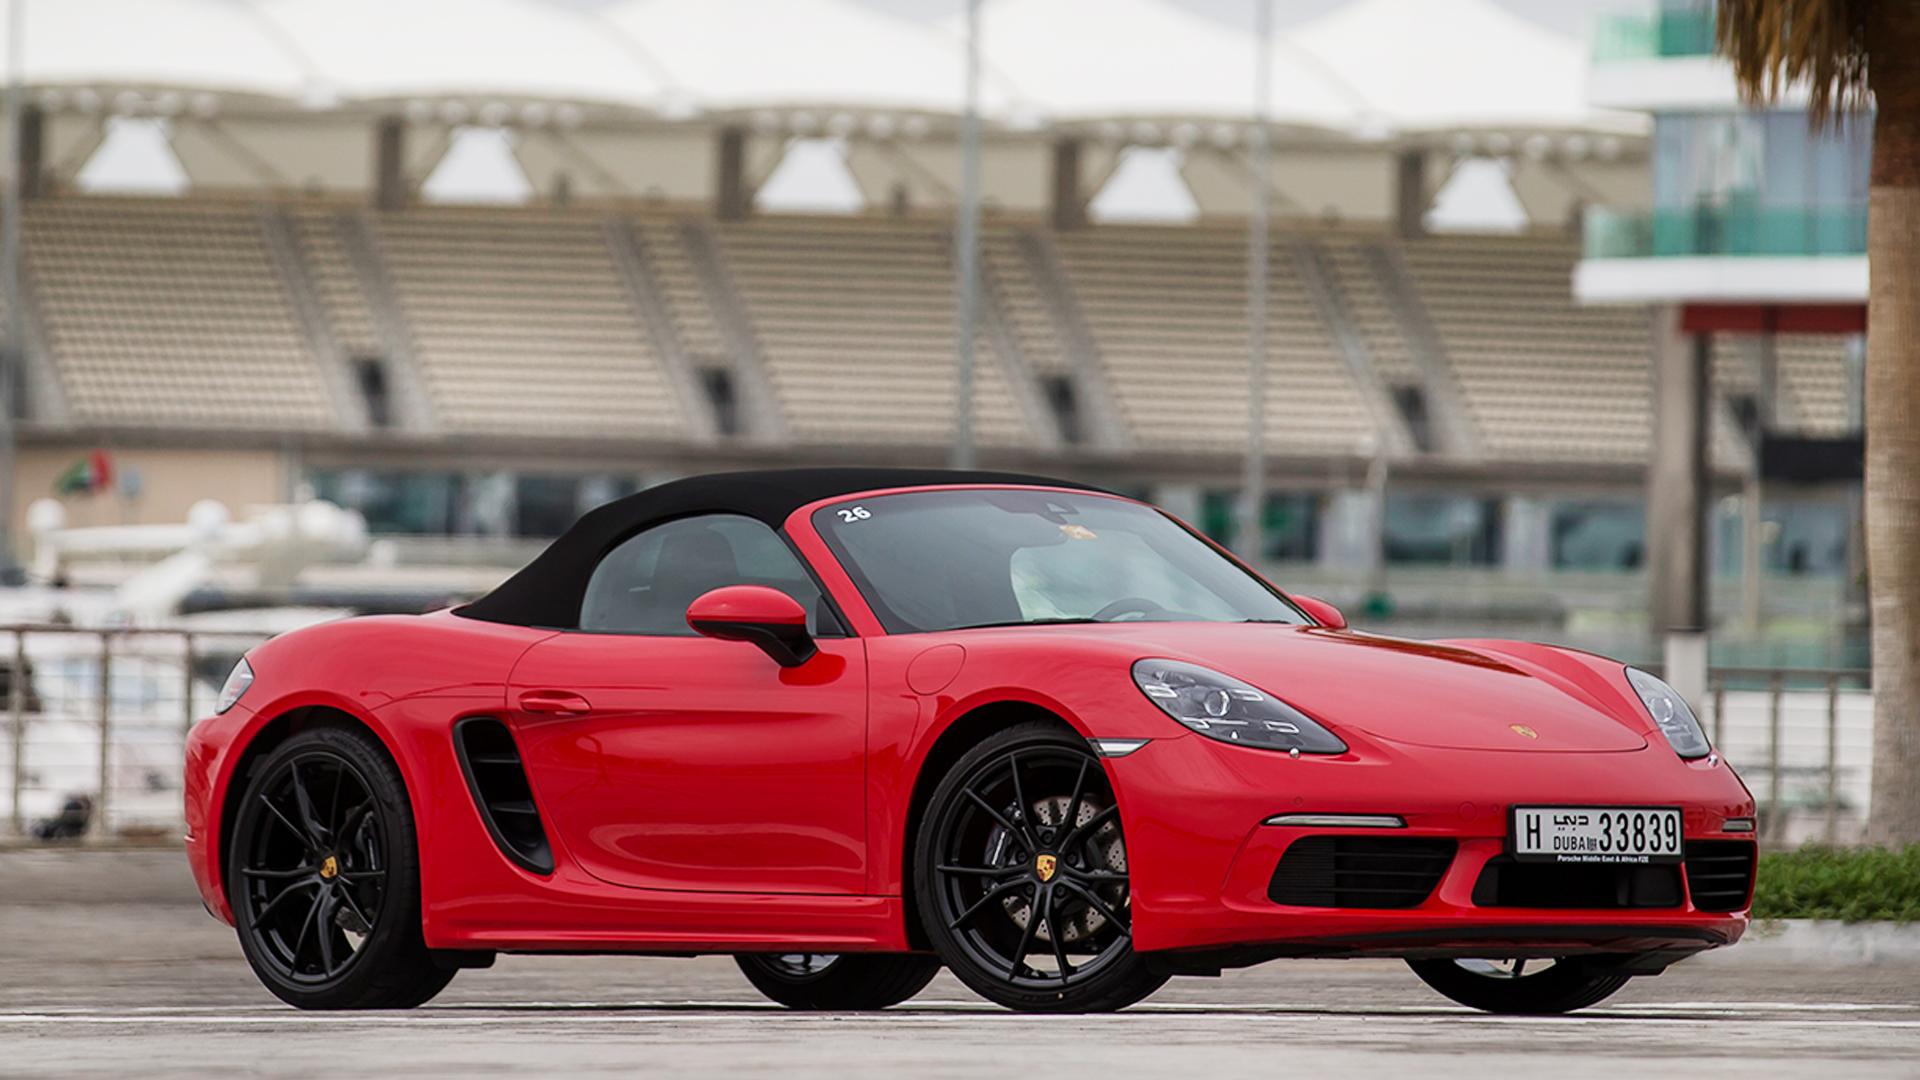 Porsche 718 2017 Price Mileage Reviews Specification Gallery